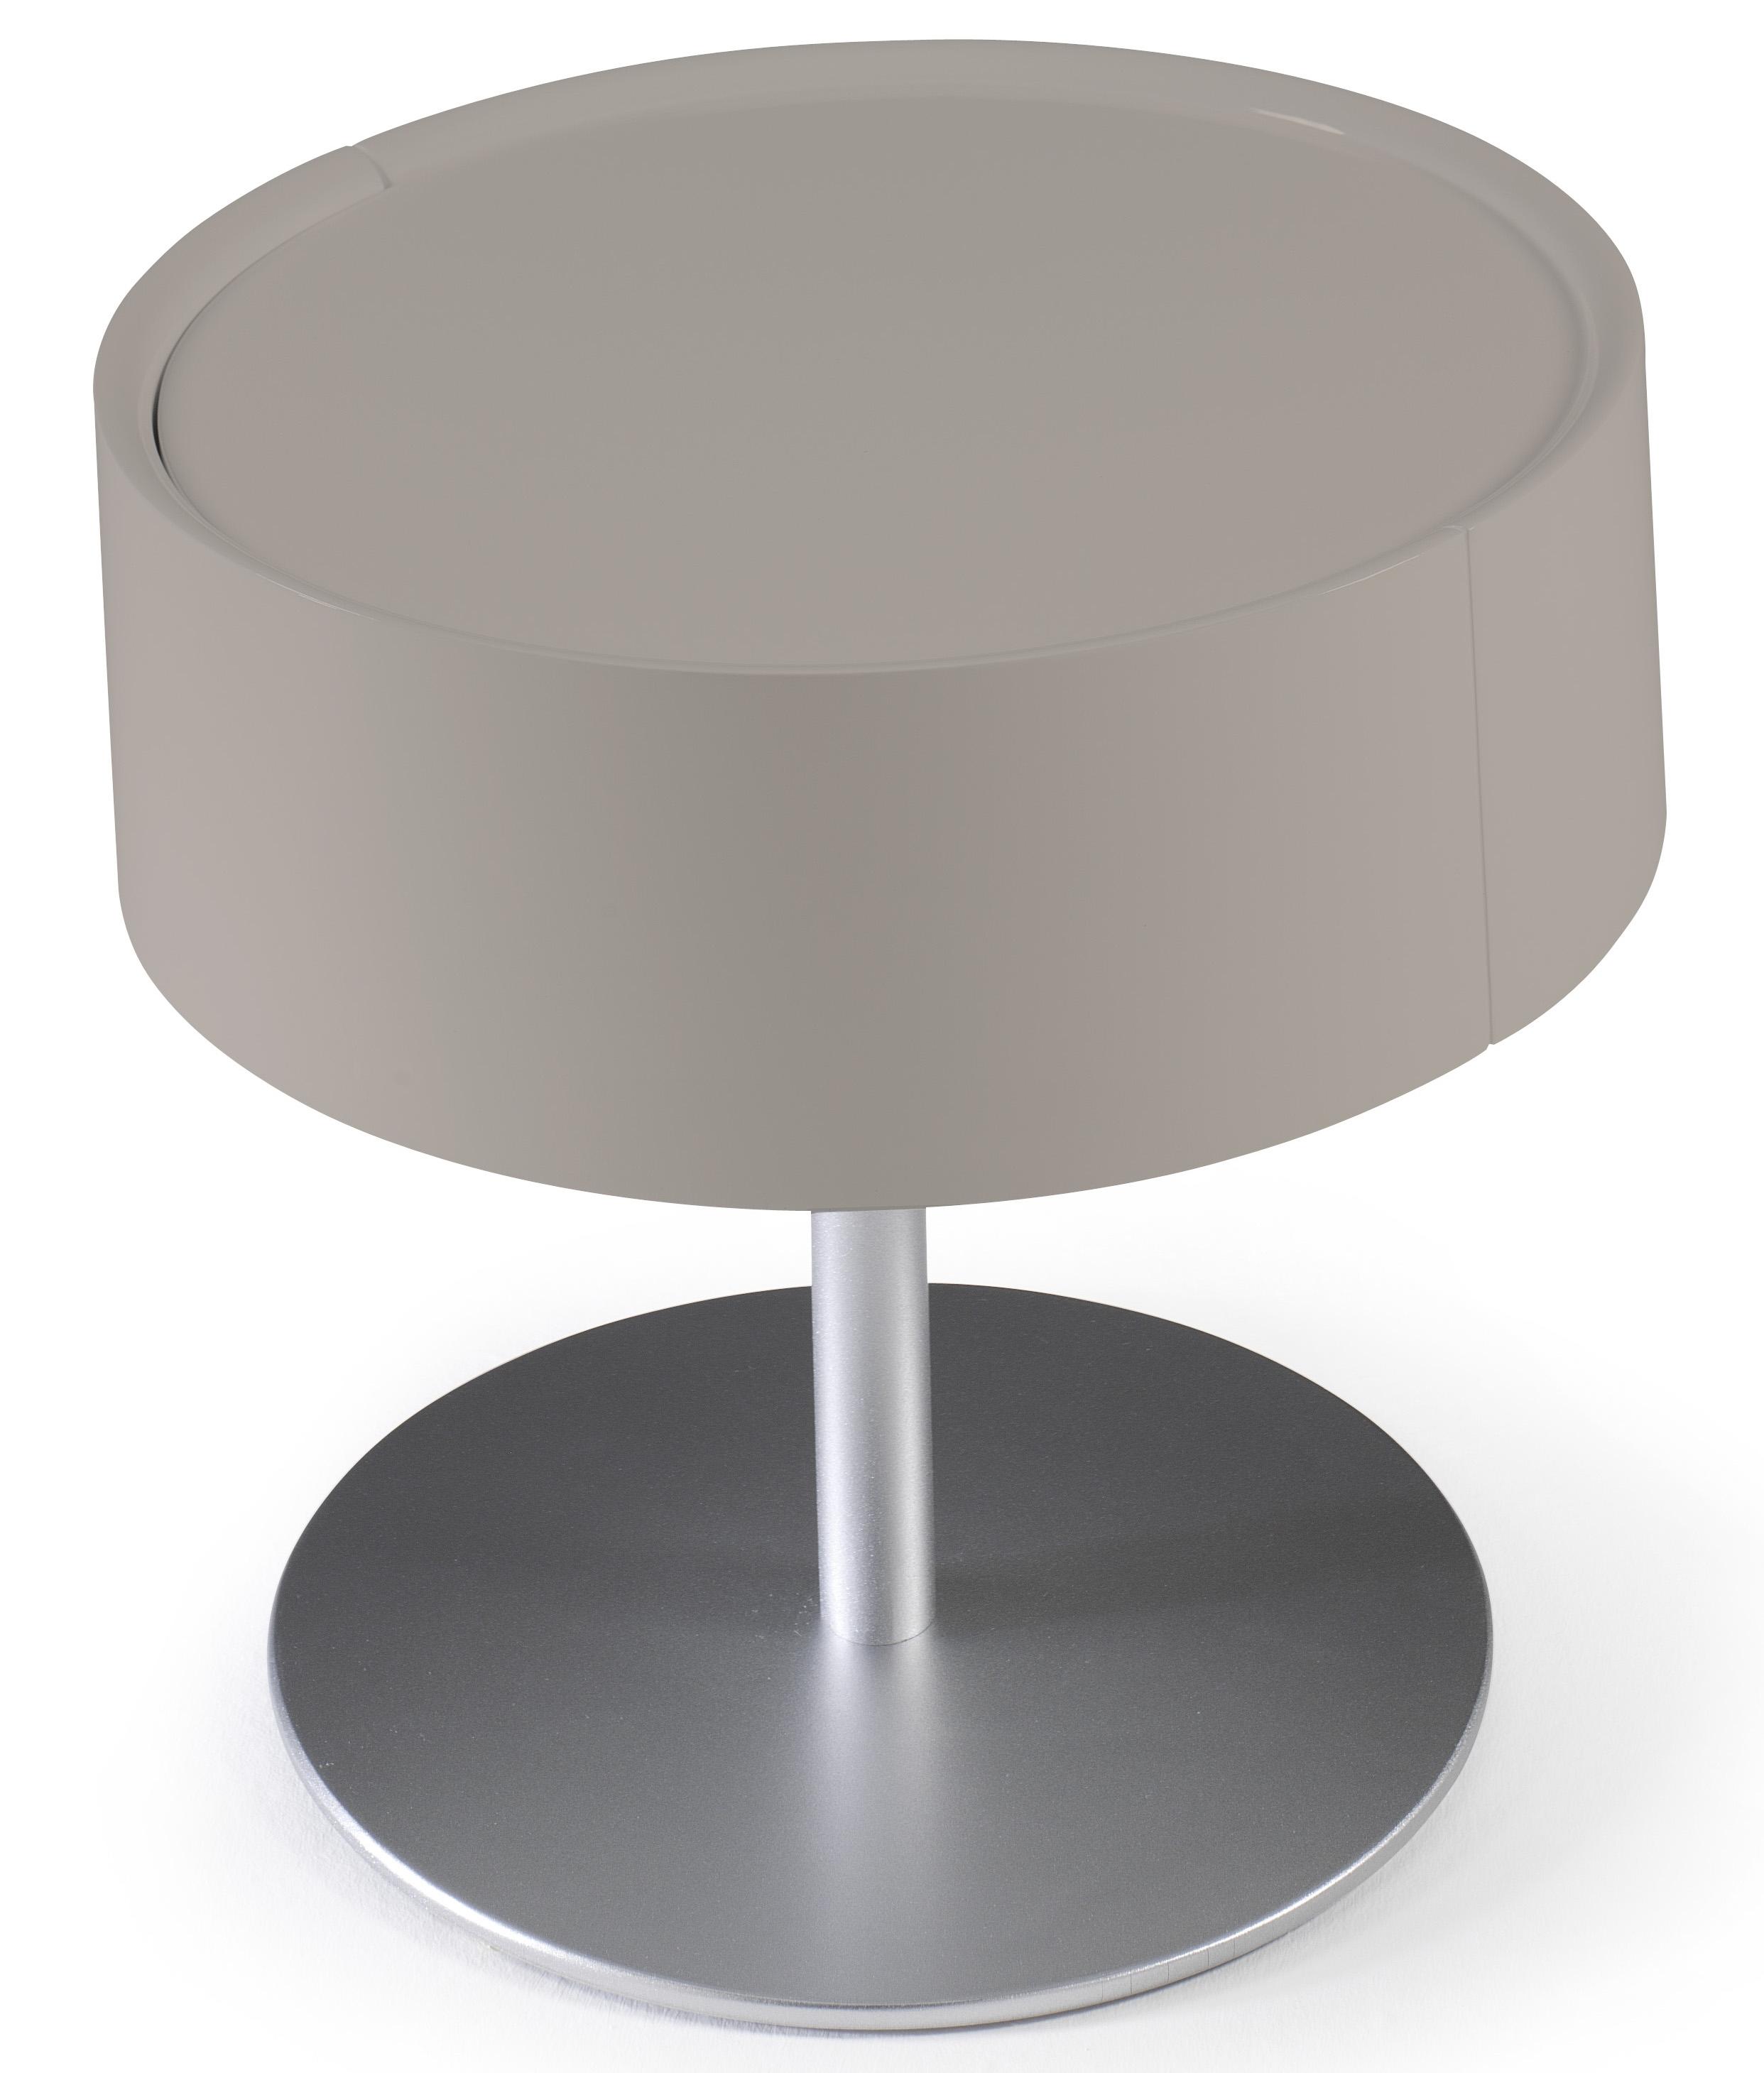 table de chevet design taupe laqu torsada. Black Bedroom Furniture Sets. Home Design Ideas